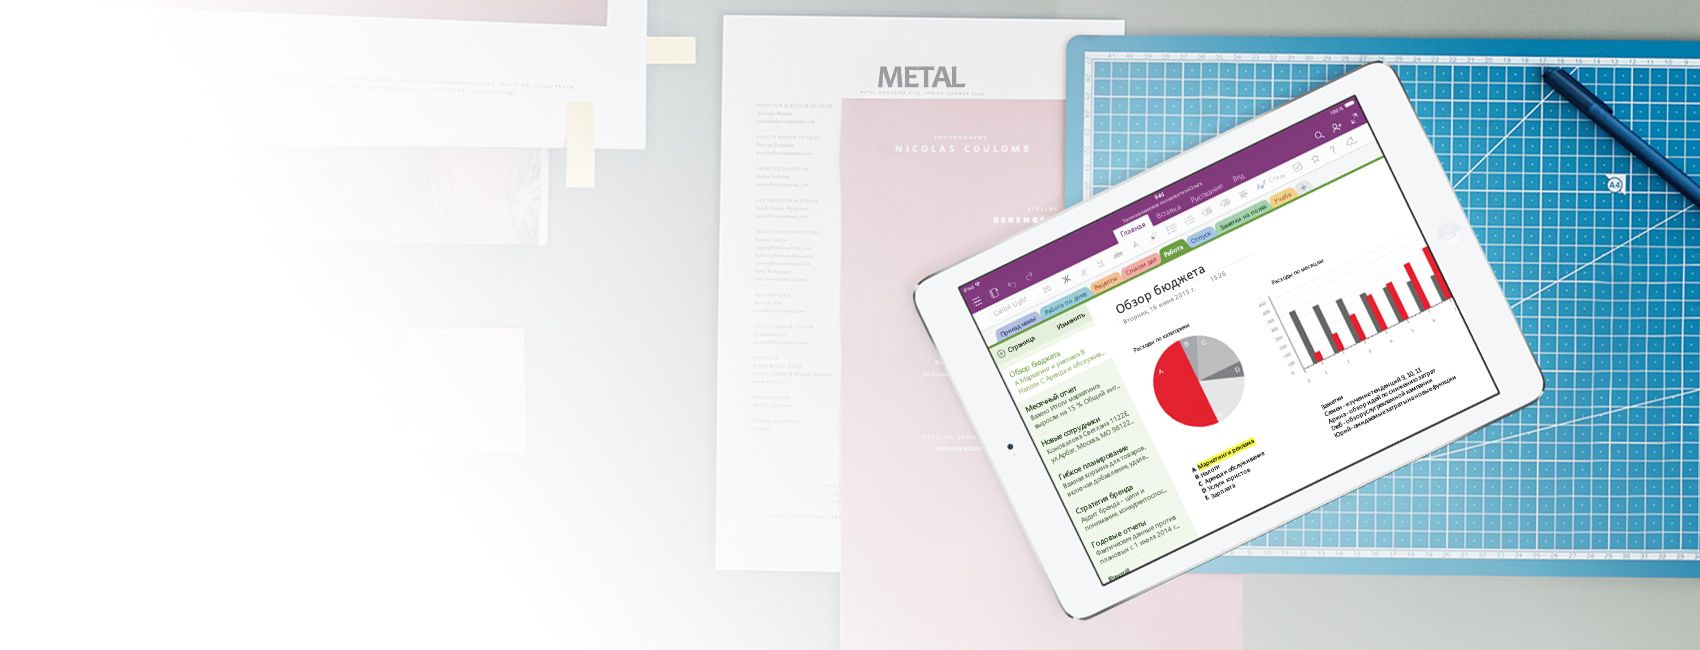 iPad, на экране которого– записная книжка OneNote с обзором бюджета с диаграммами и графиками.